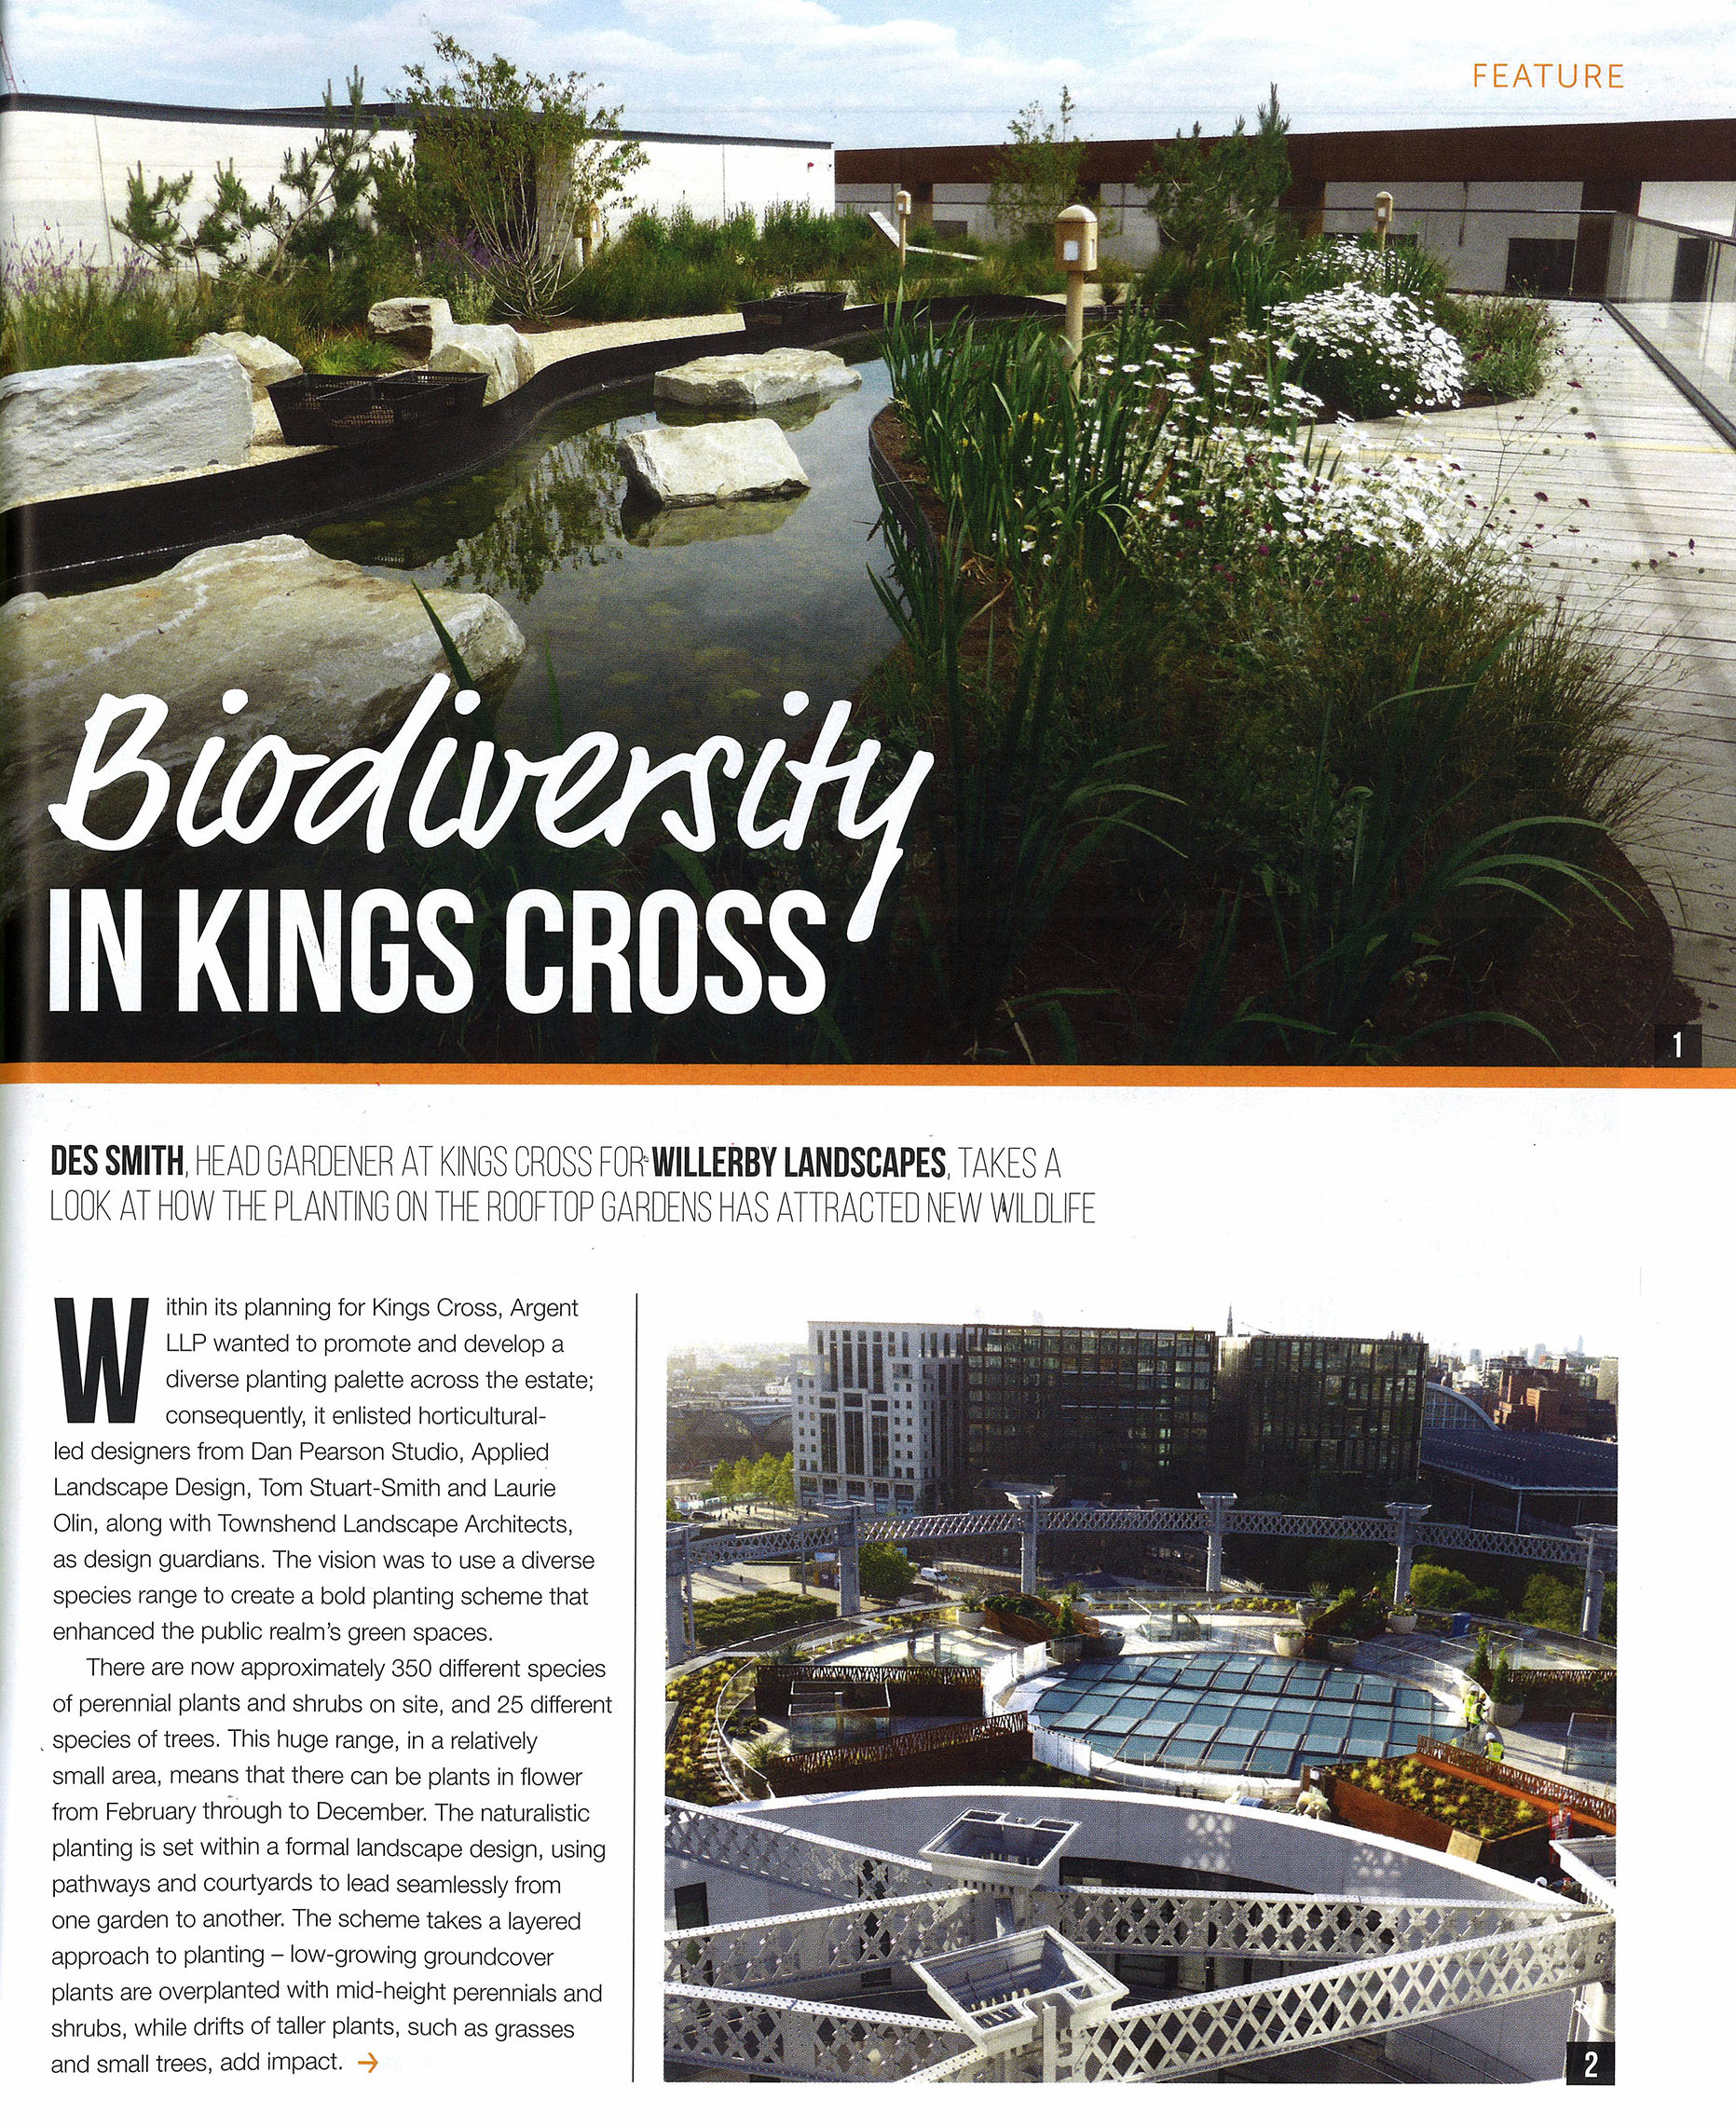 Biodiversity at Kings Cross